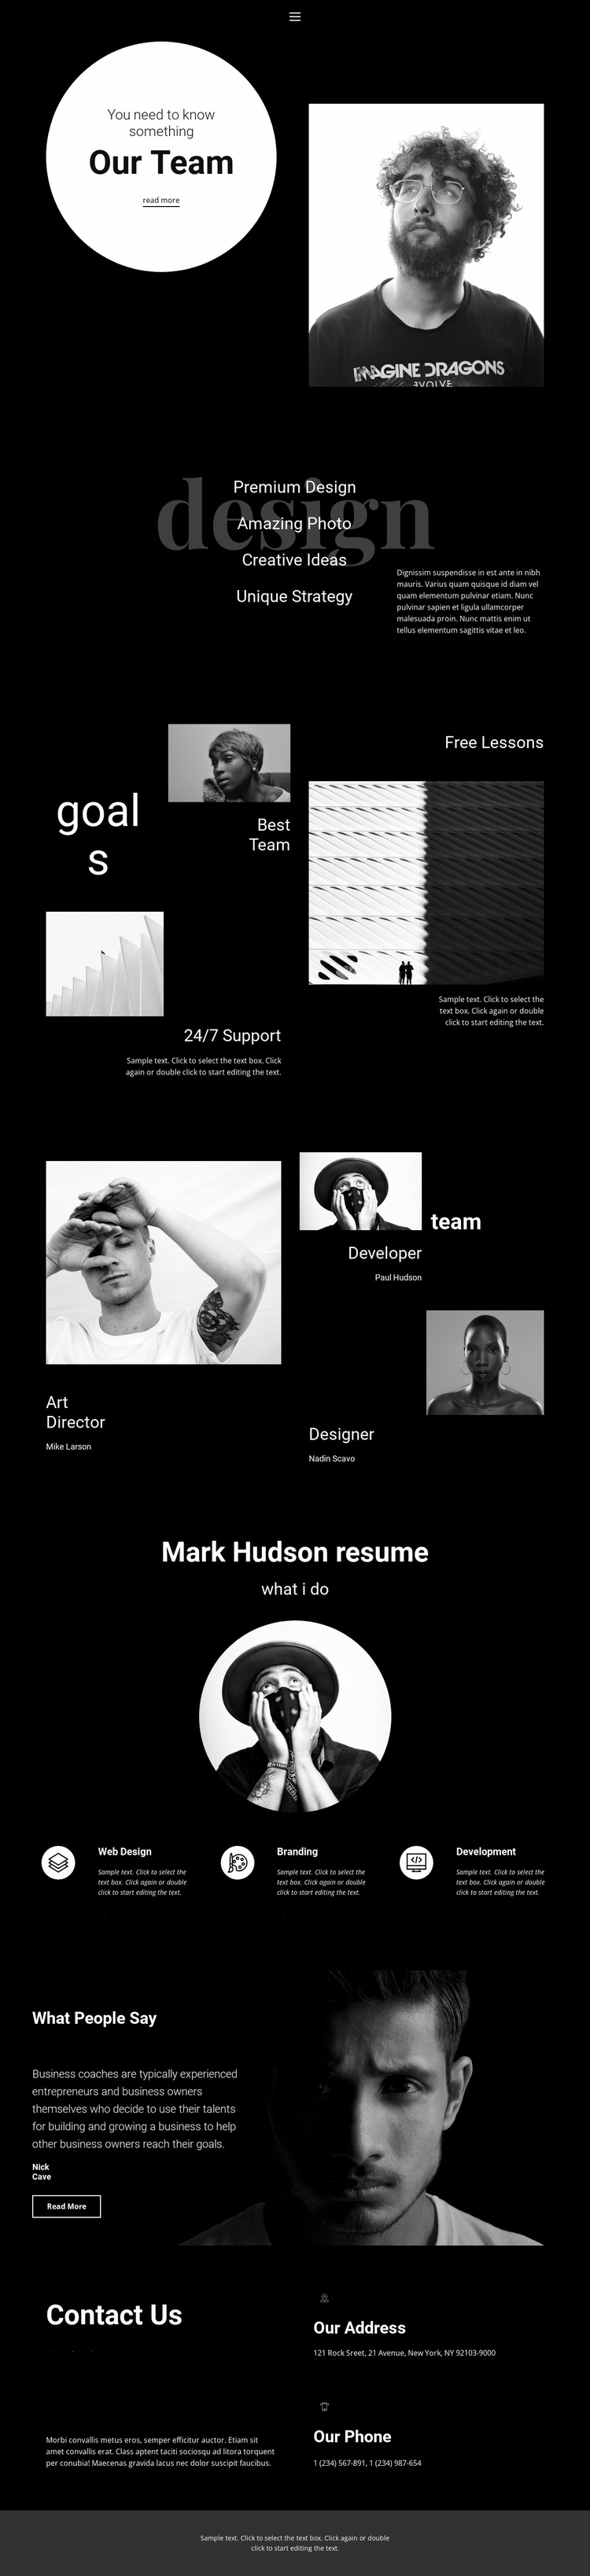 Design and development team Landing Page